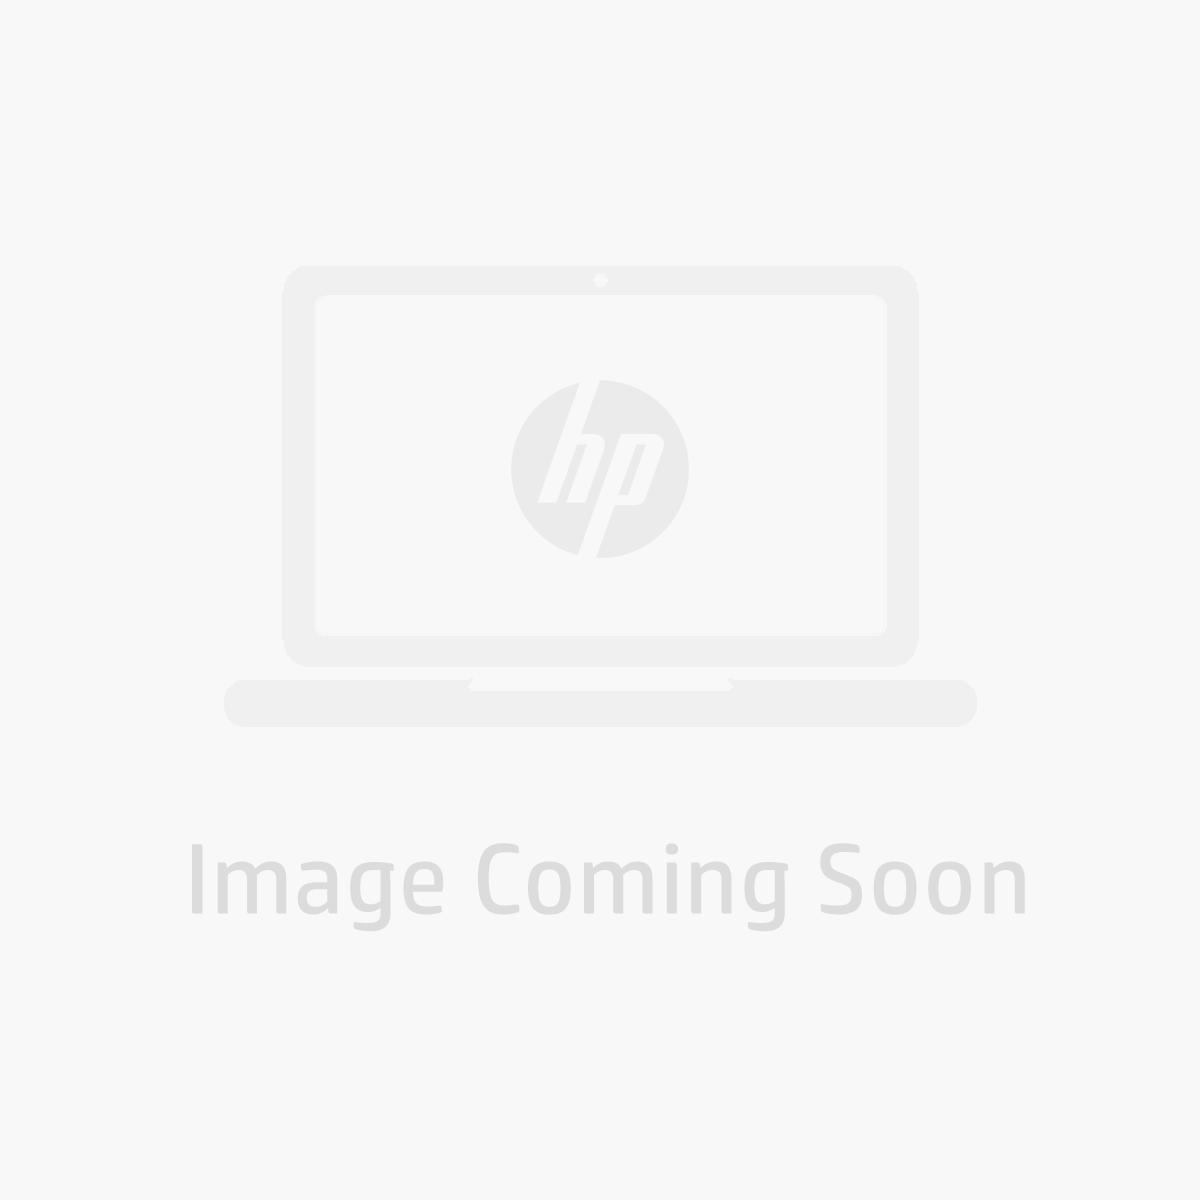 SanDisk Ultra 16GB, USB 3.0